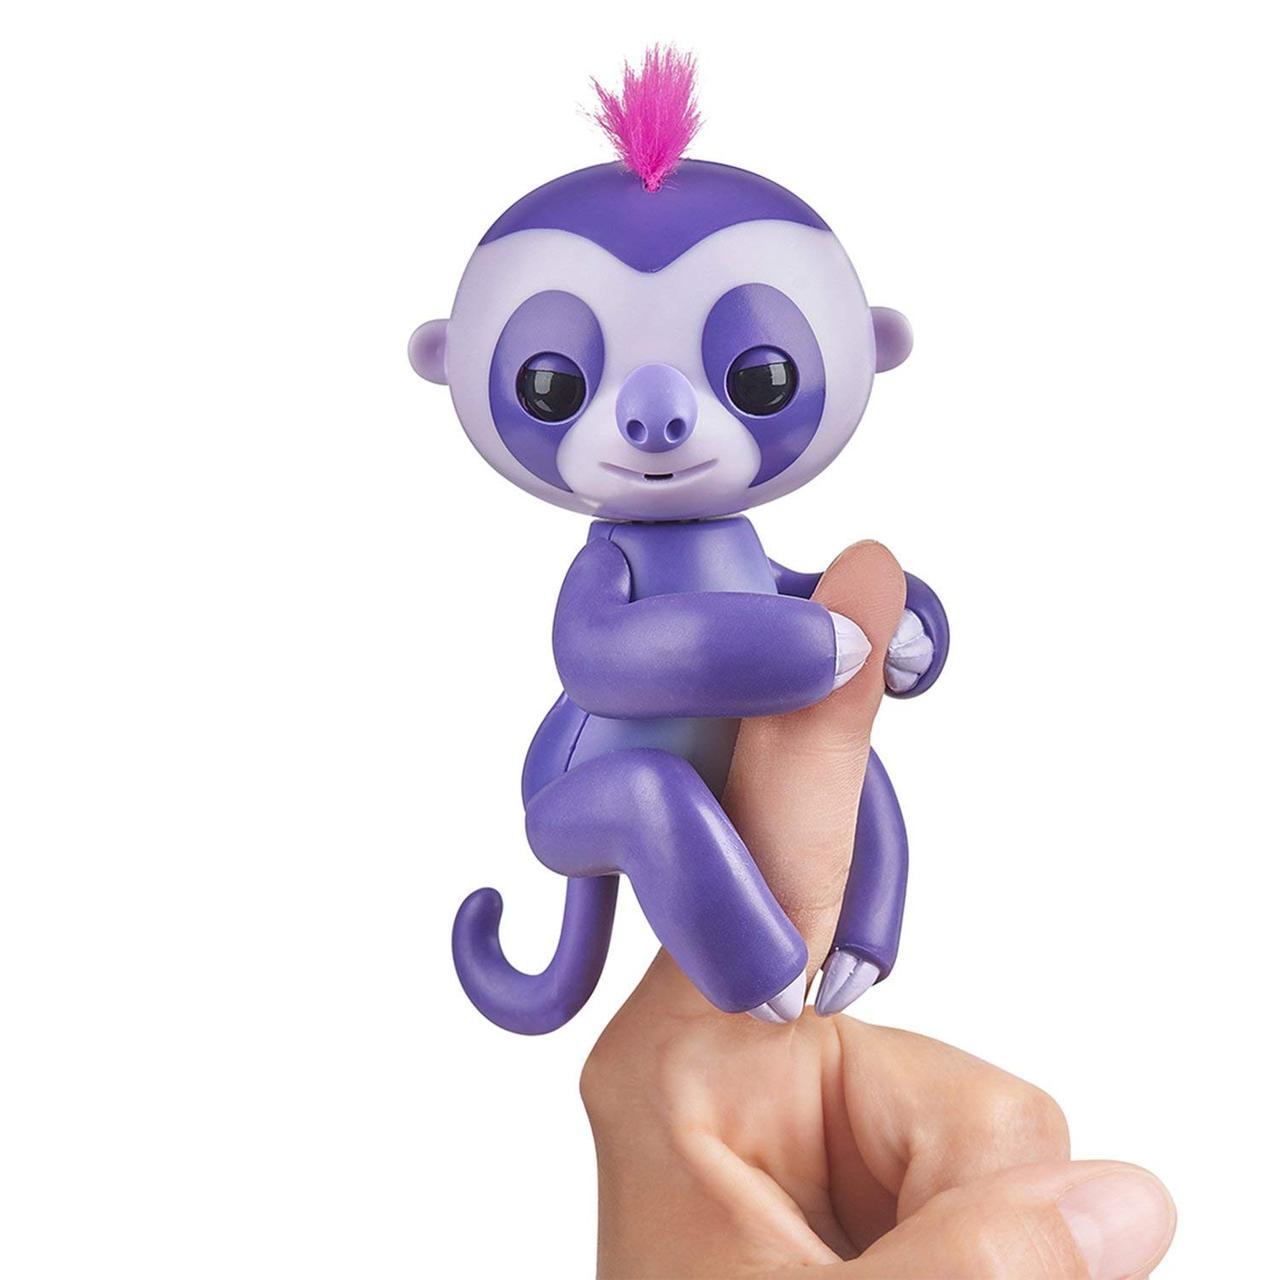 Интерактивный ленивец Марж Оригинал WowWee Fingerlings Baby Sloth - Marge Purple